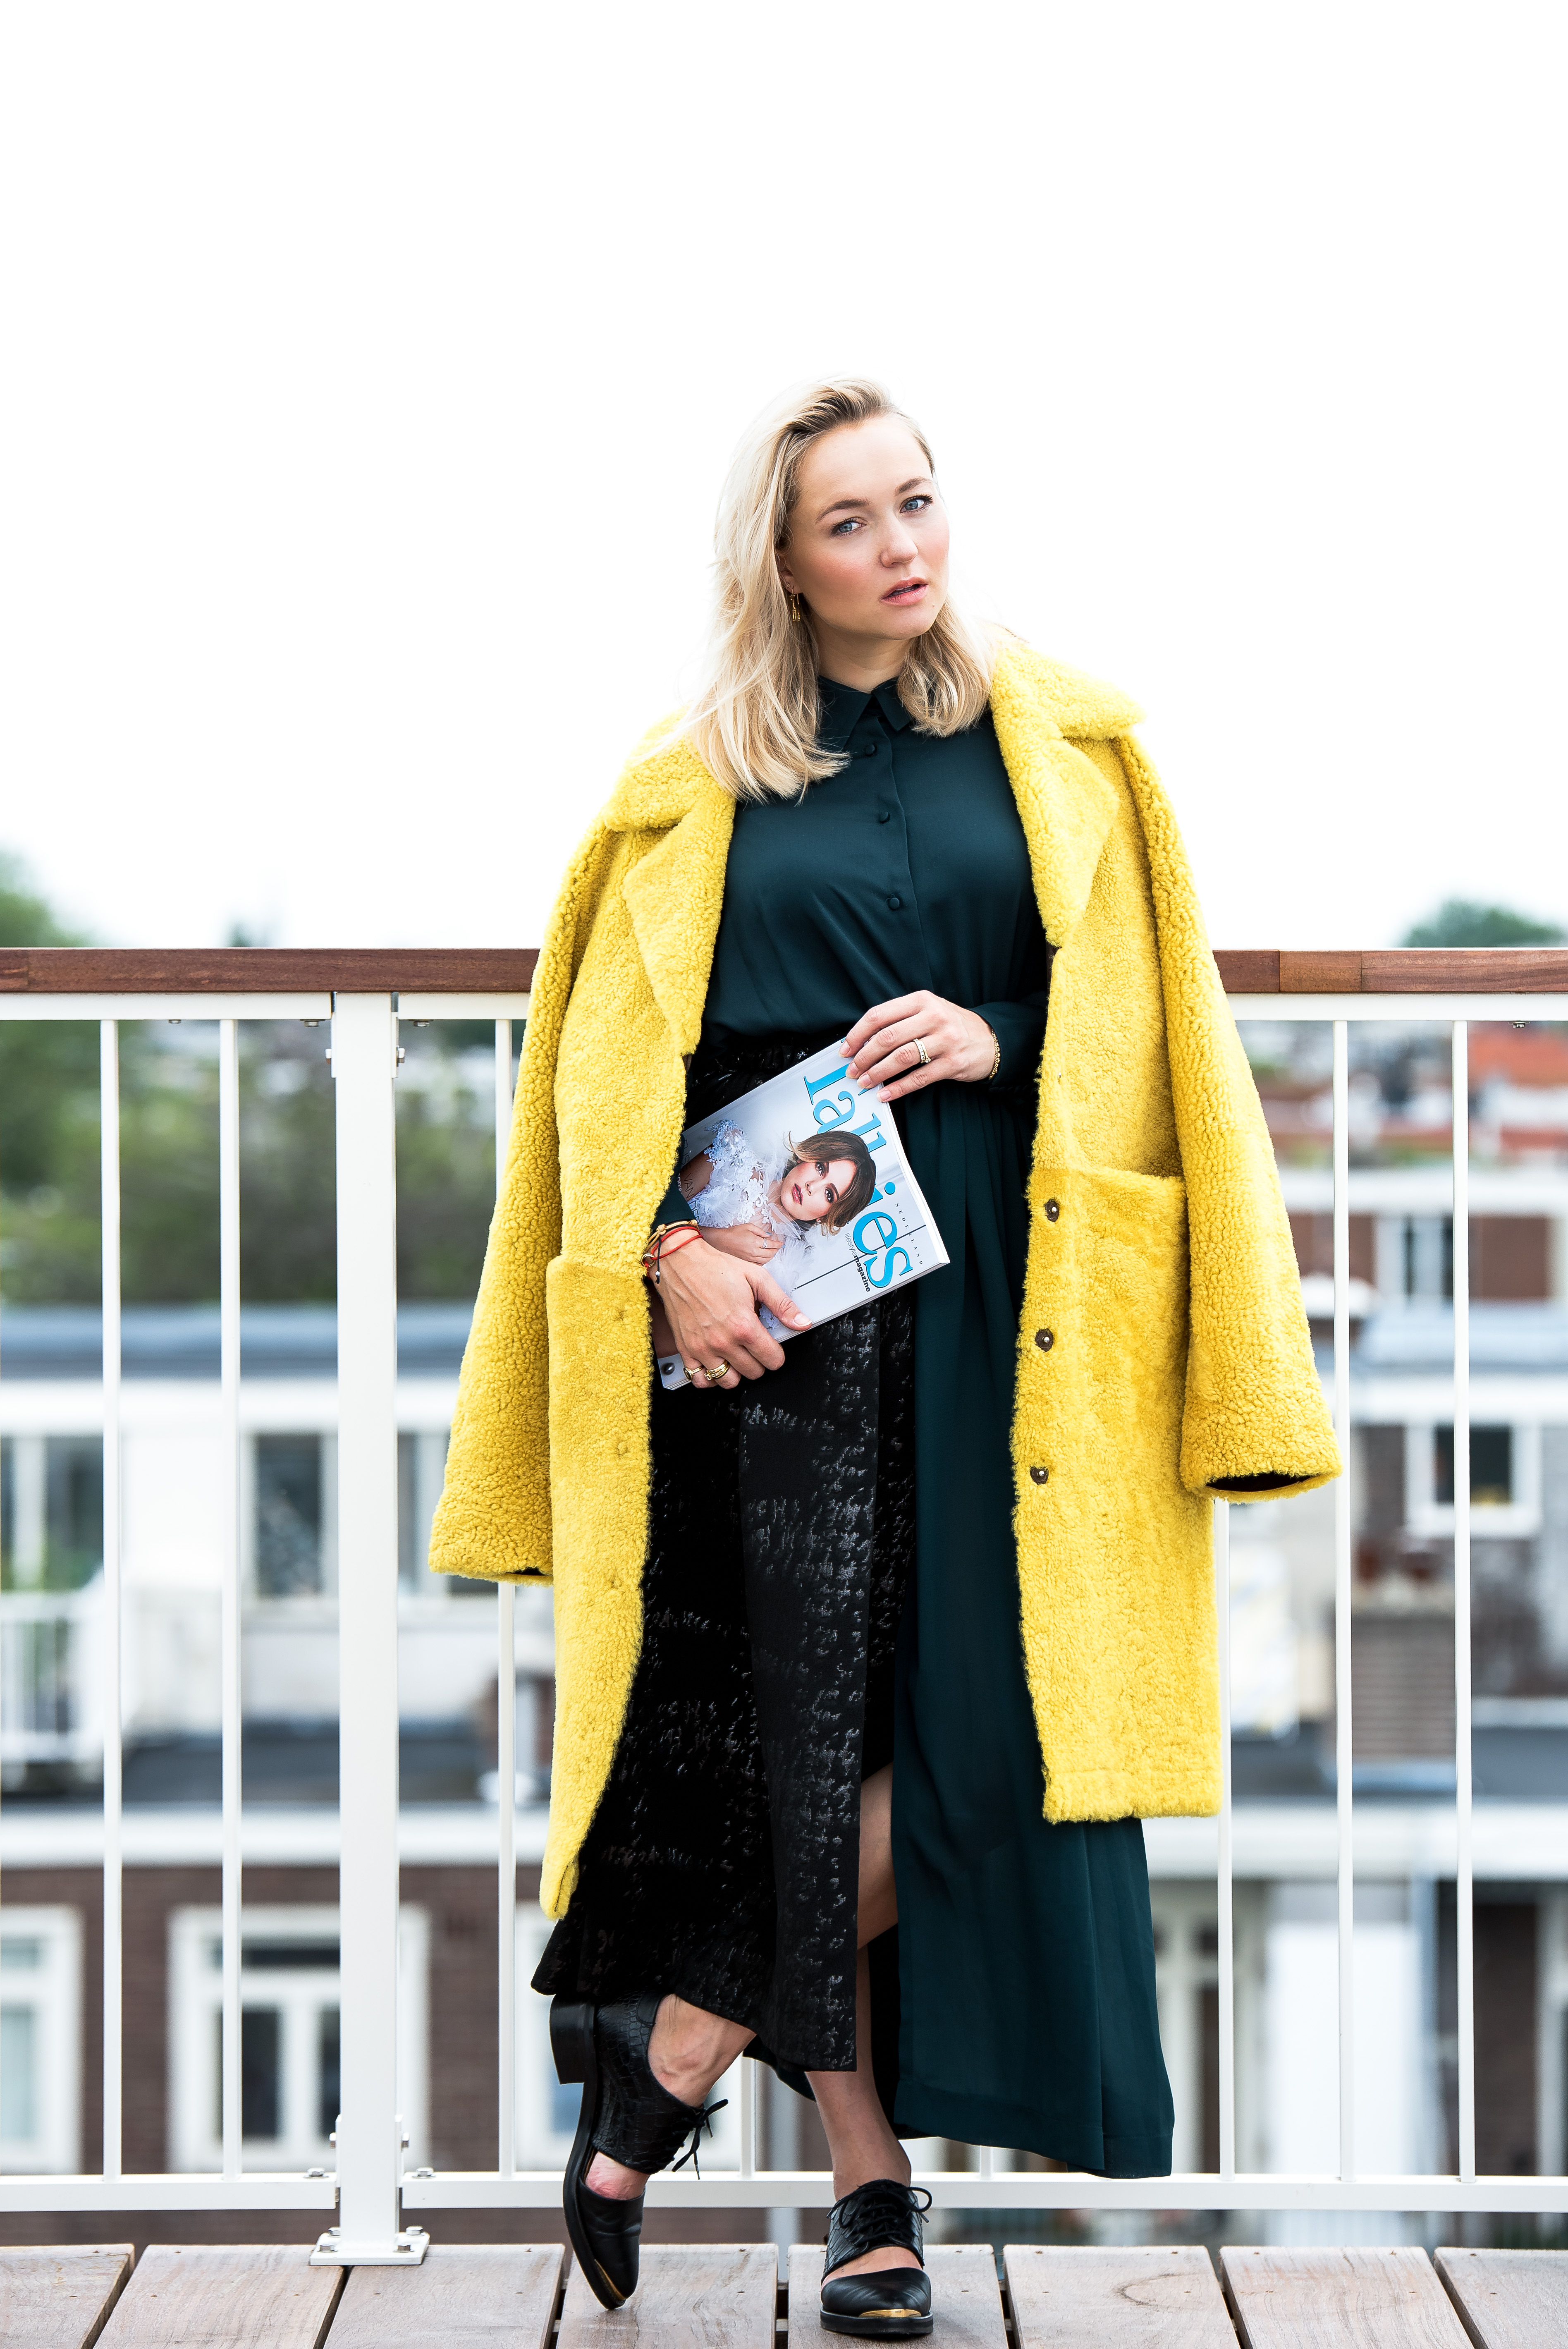 Talkies Magazine - Carolien Spoor